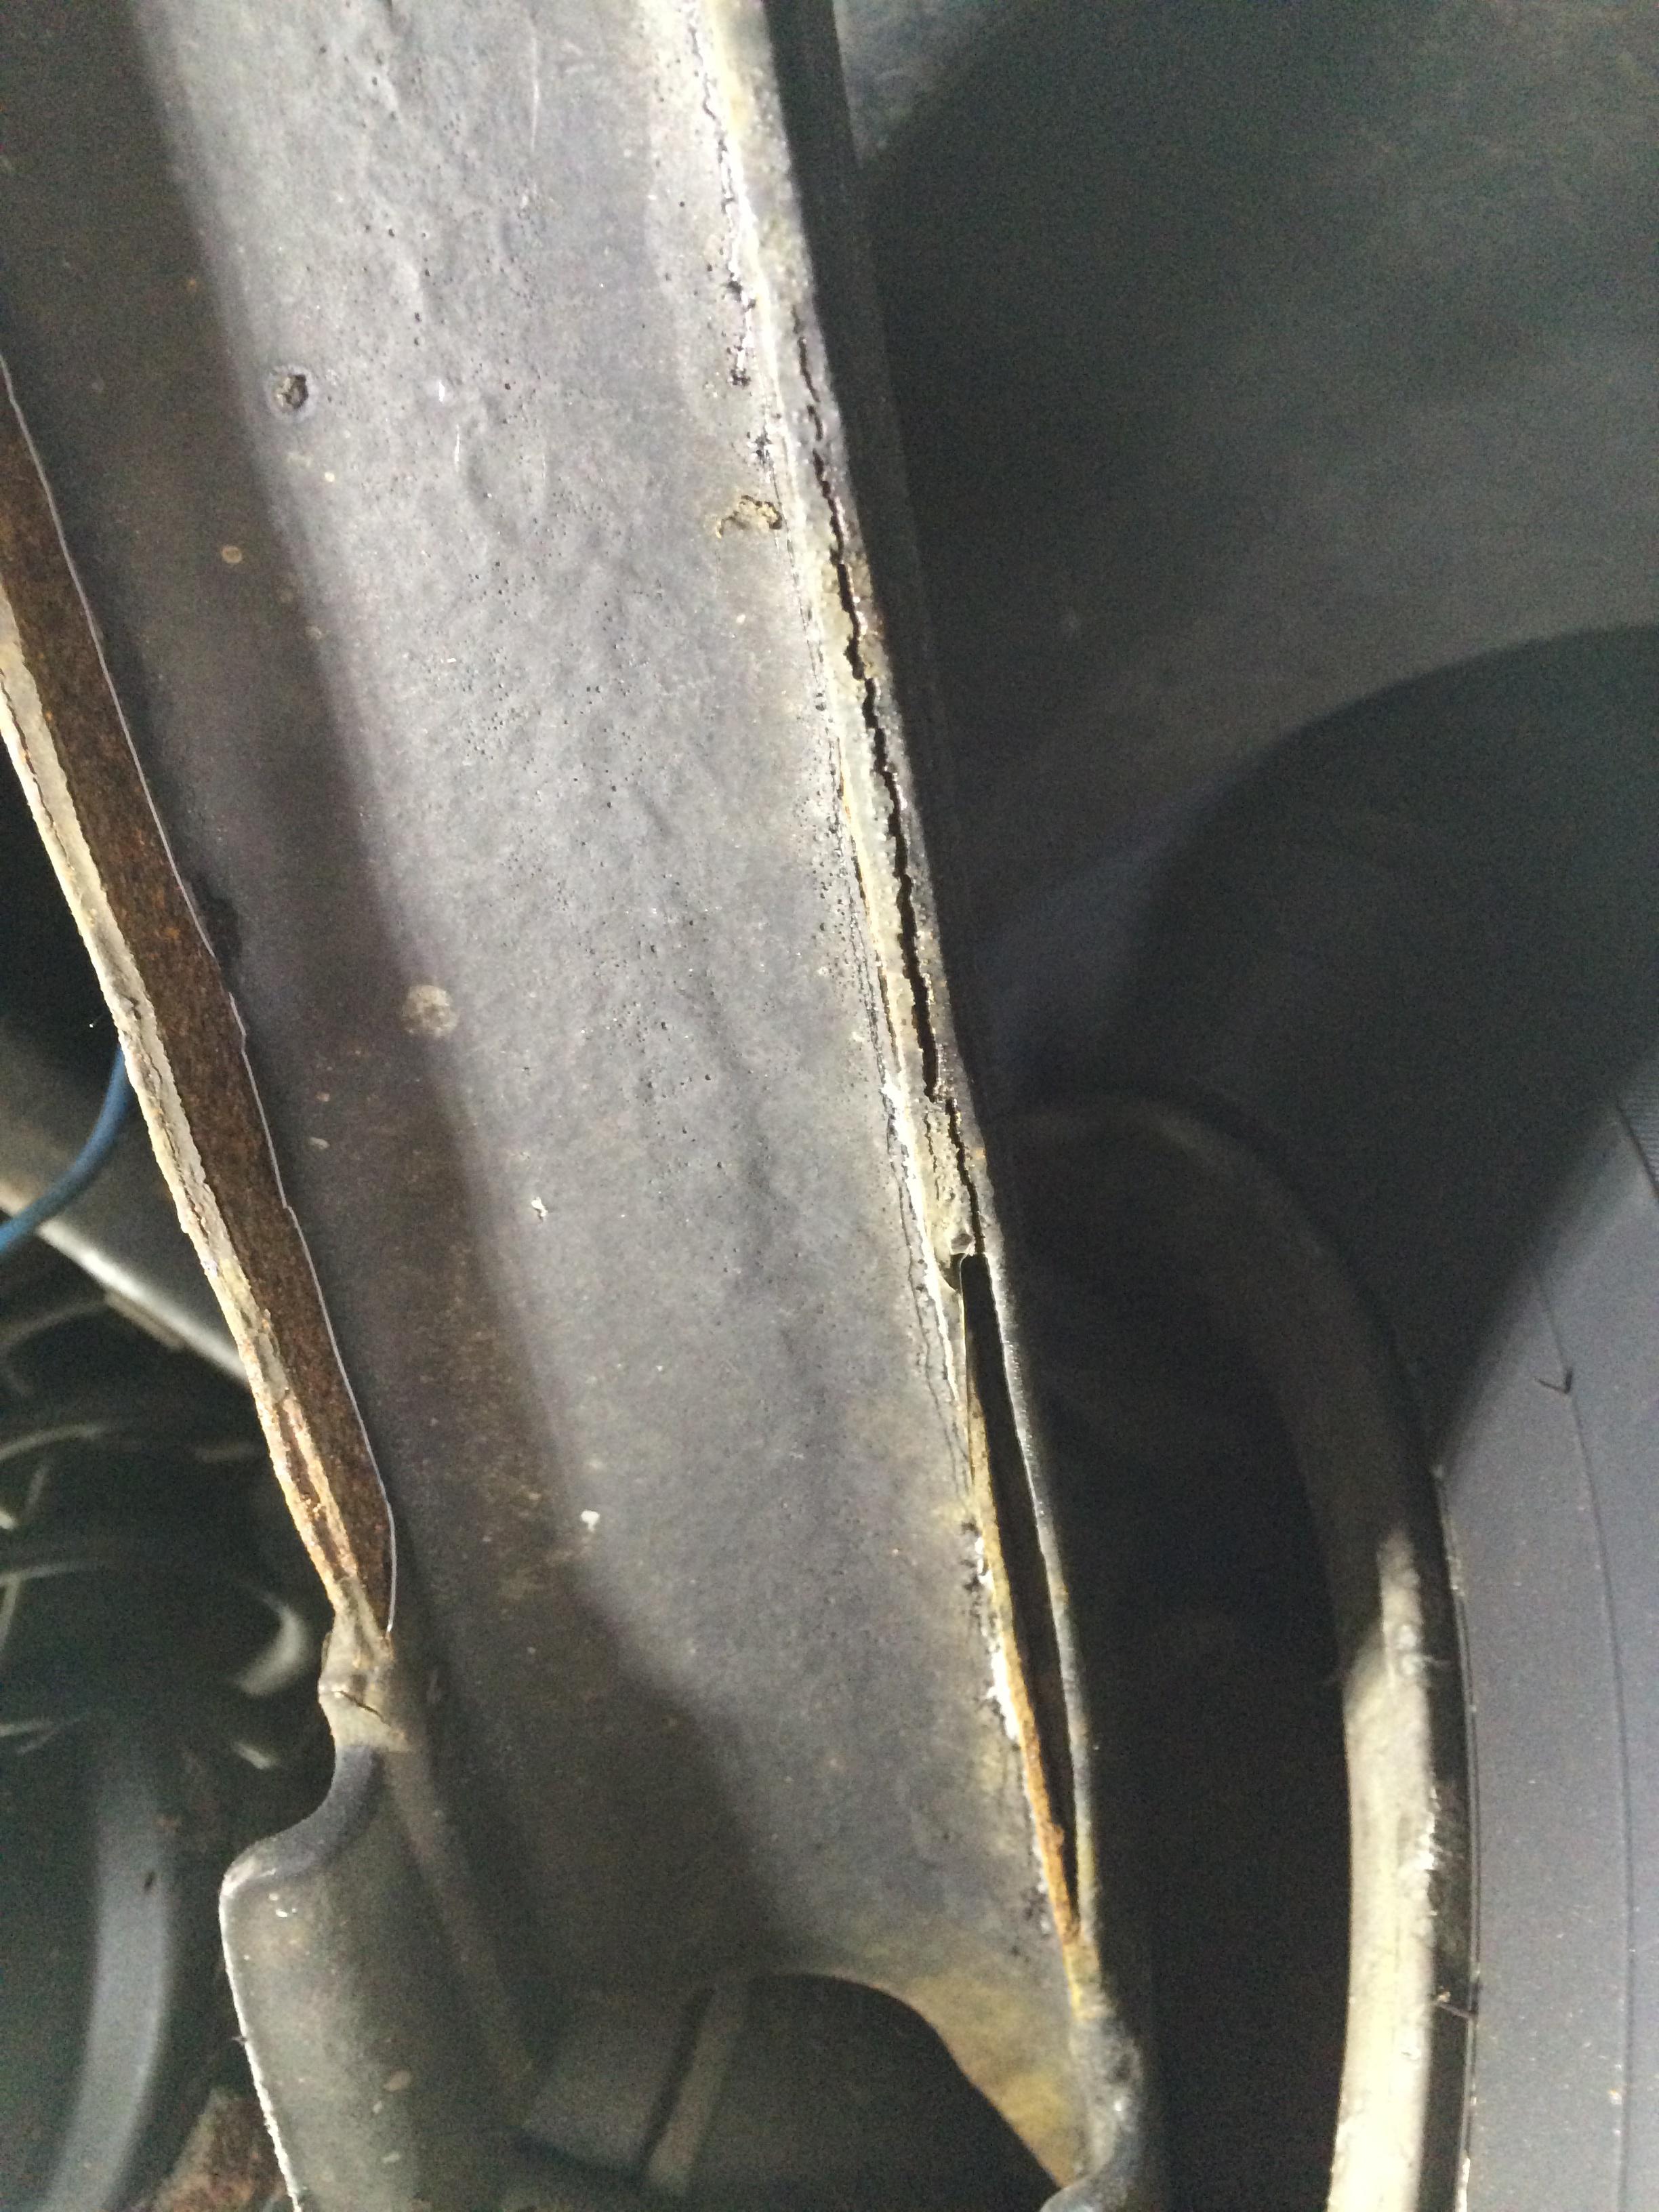 Trailing Arm Rust